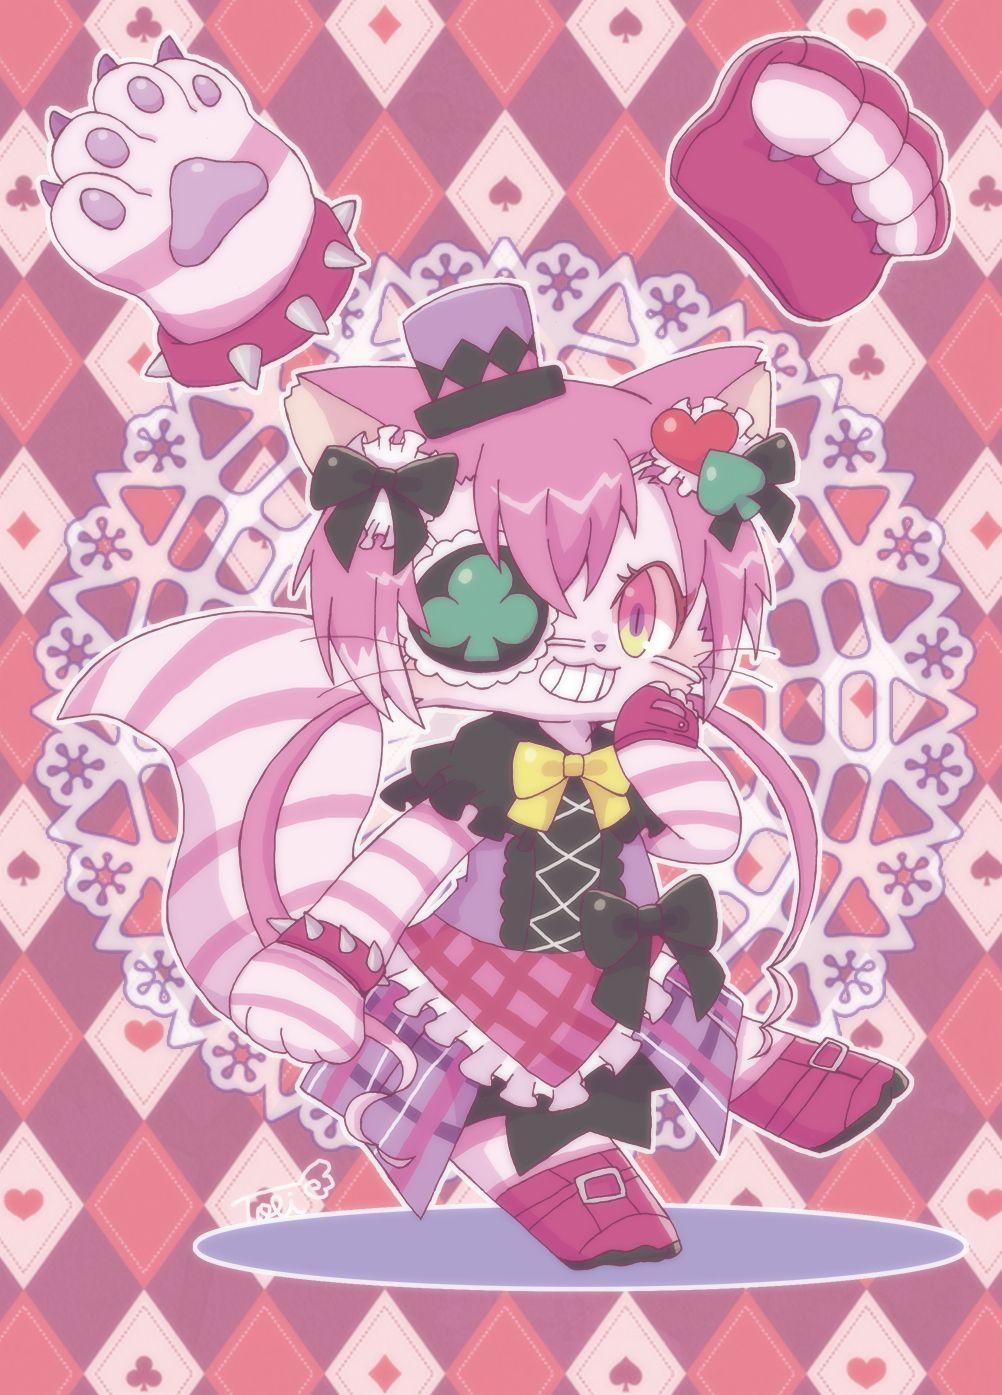 Pin by Puggo on CAT BUSTERS Anime, Neko, Furry